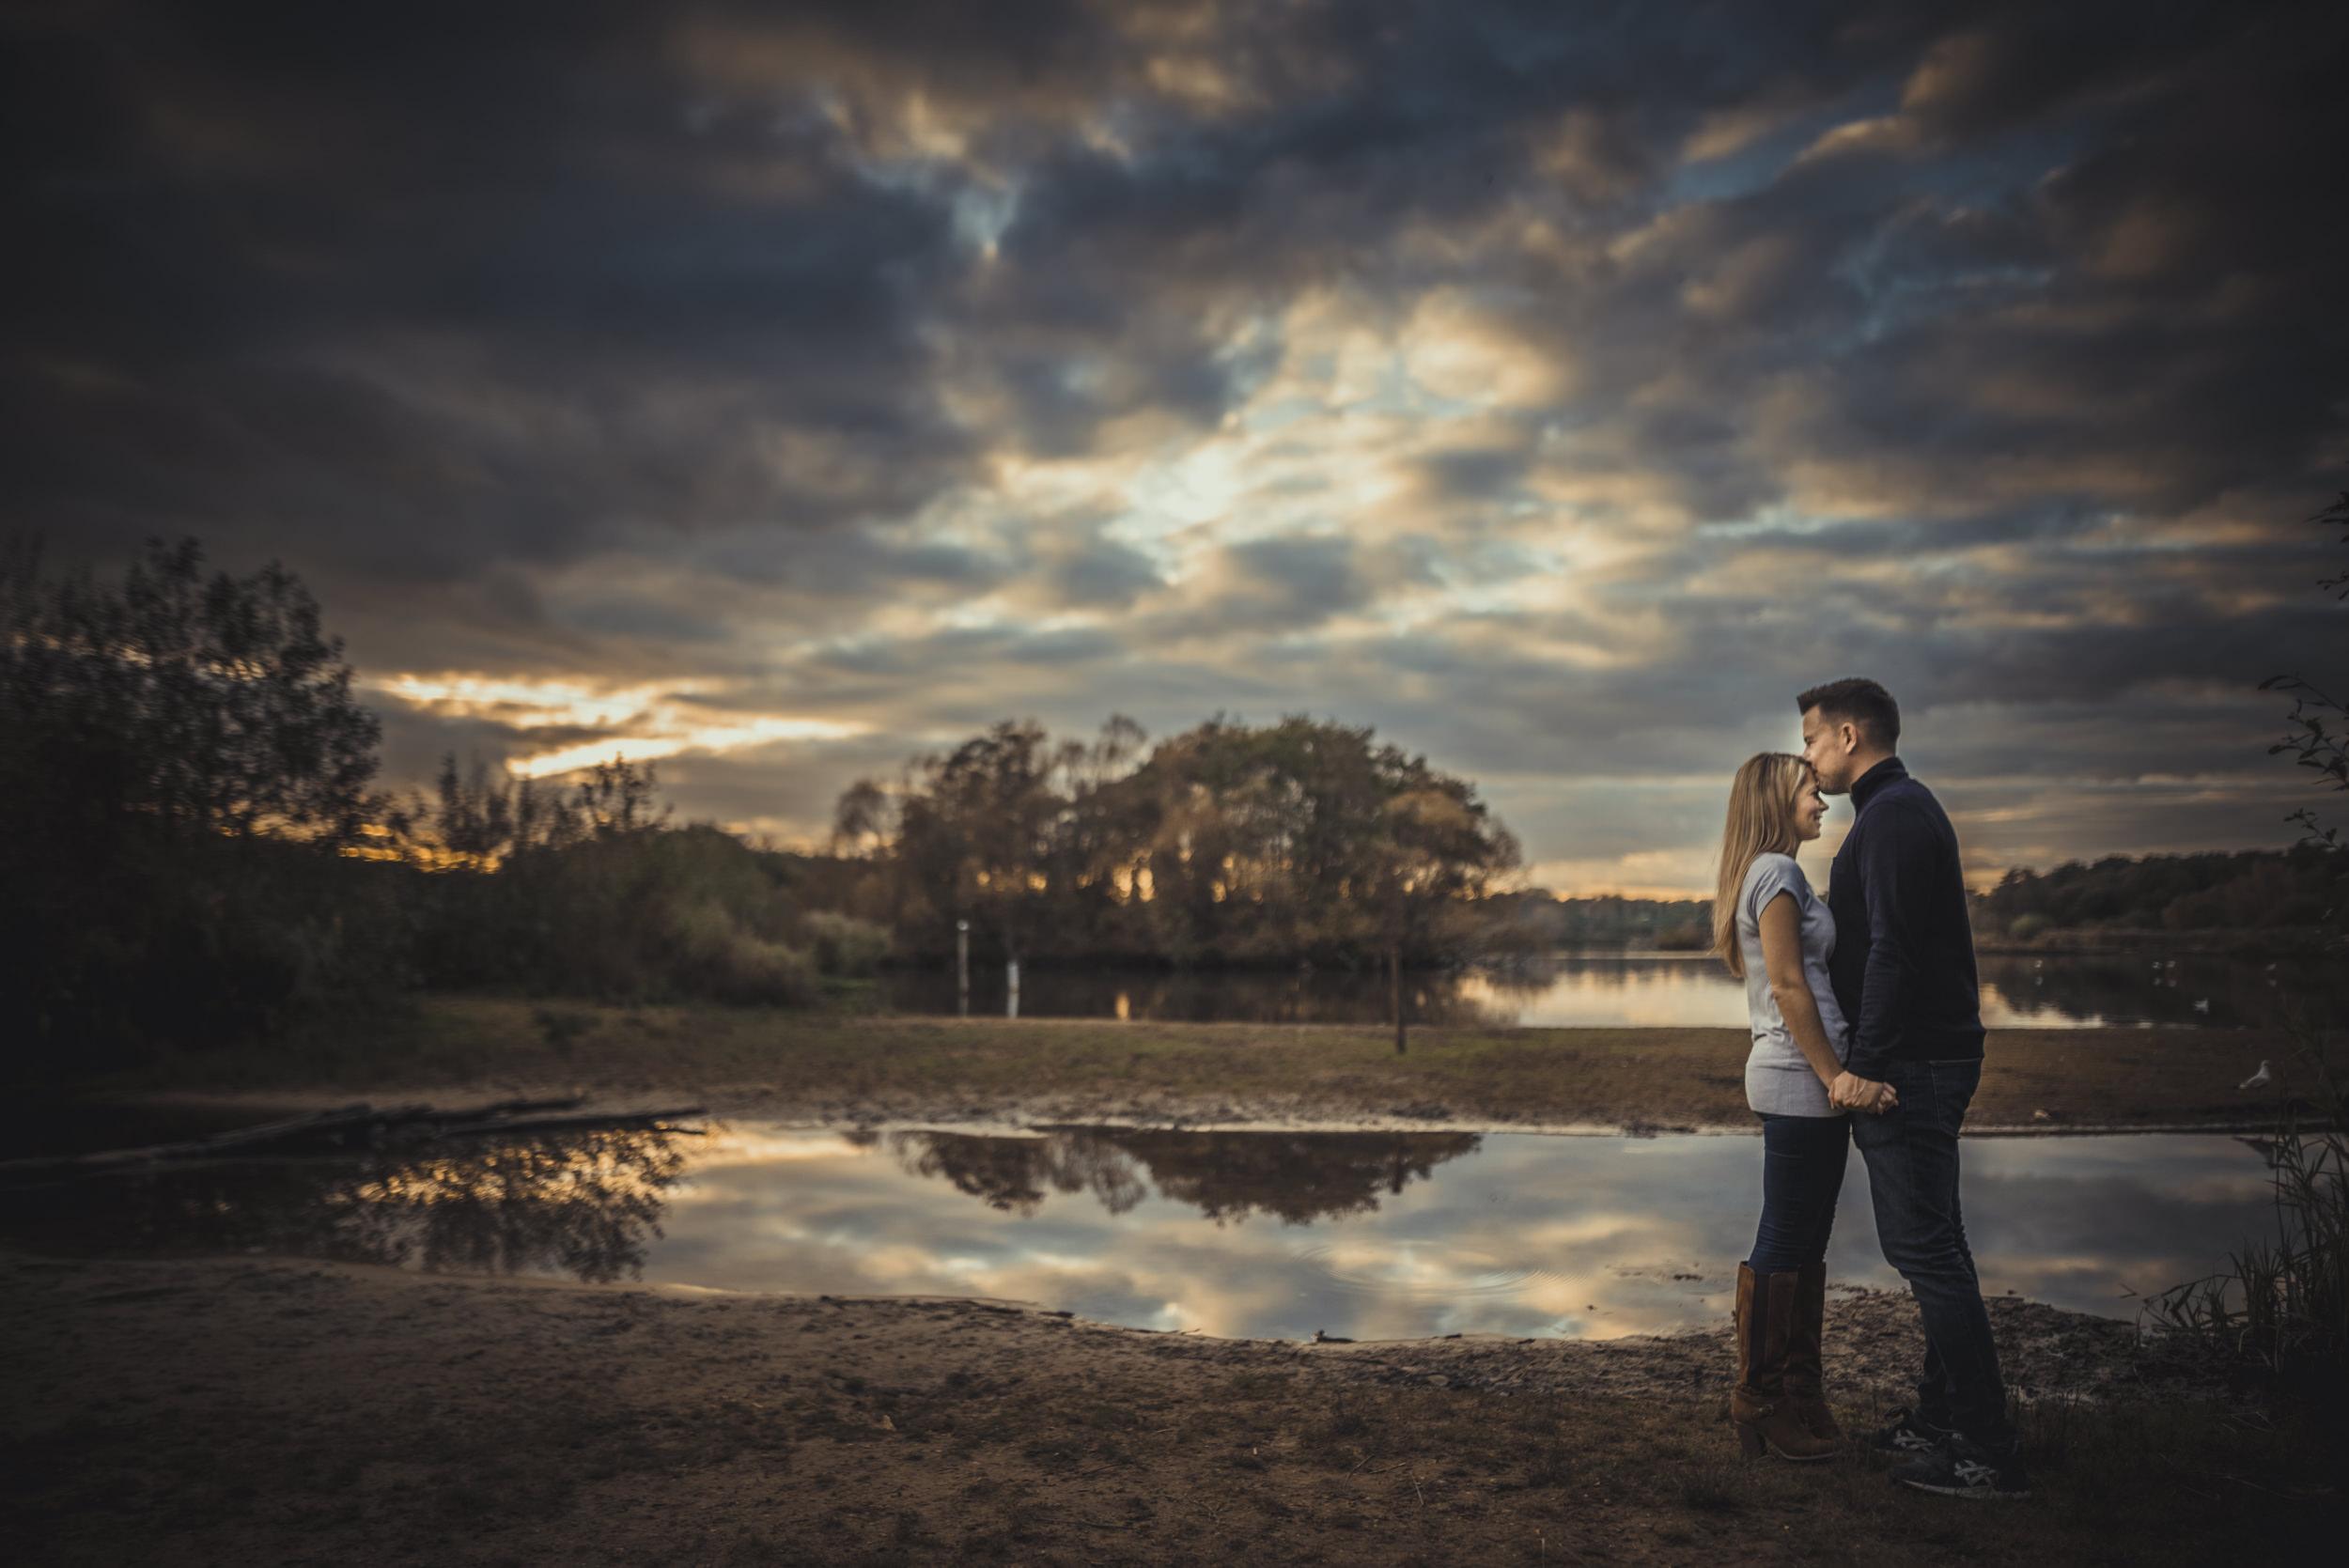 Sarah-and-Joe-Engagement-Session-Fleet-Pond-Manu-Mendoza-Wedding-Photography-024.jpg